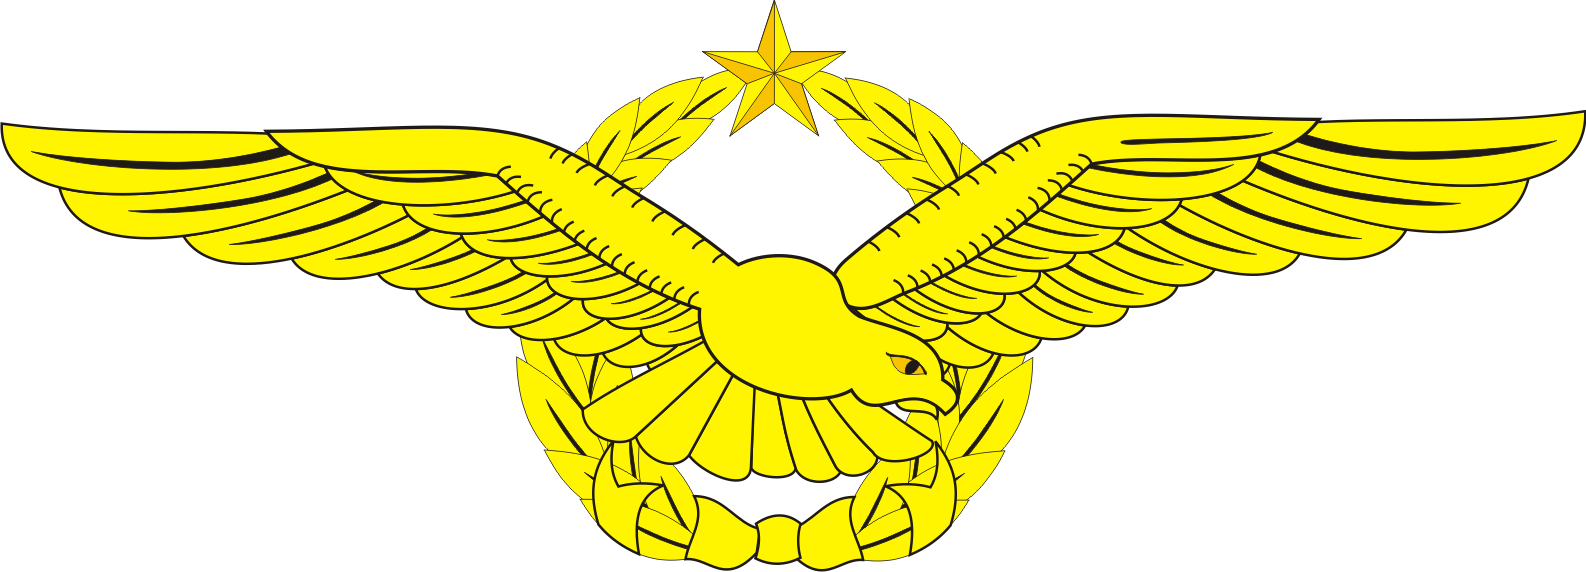 Gambar Brevet Wing Penerbang Tni Au Logo Lambang Indonesia